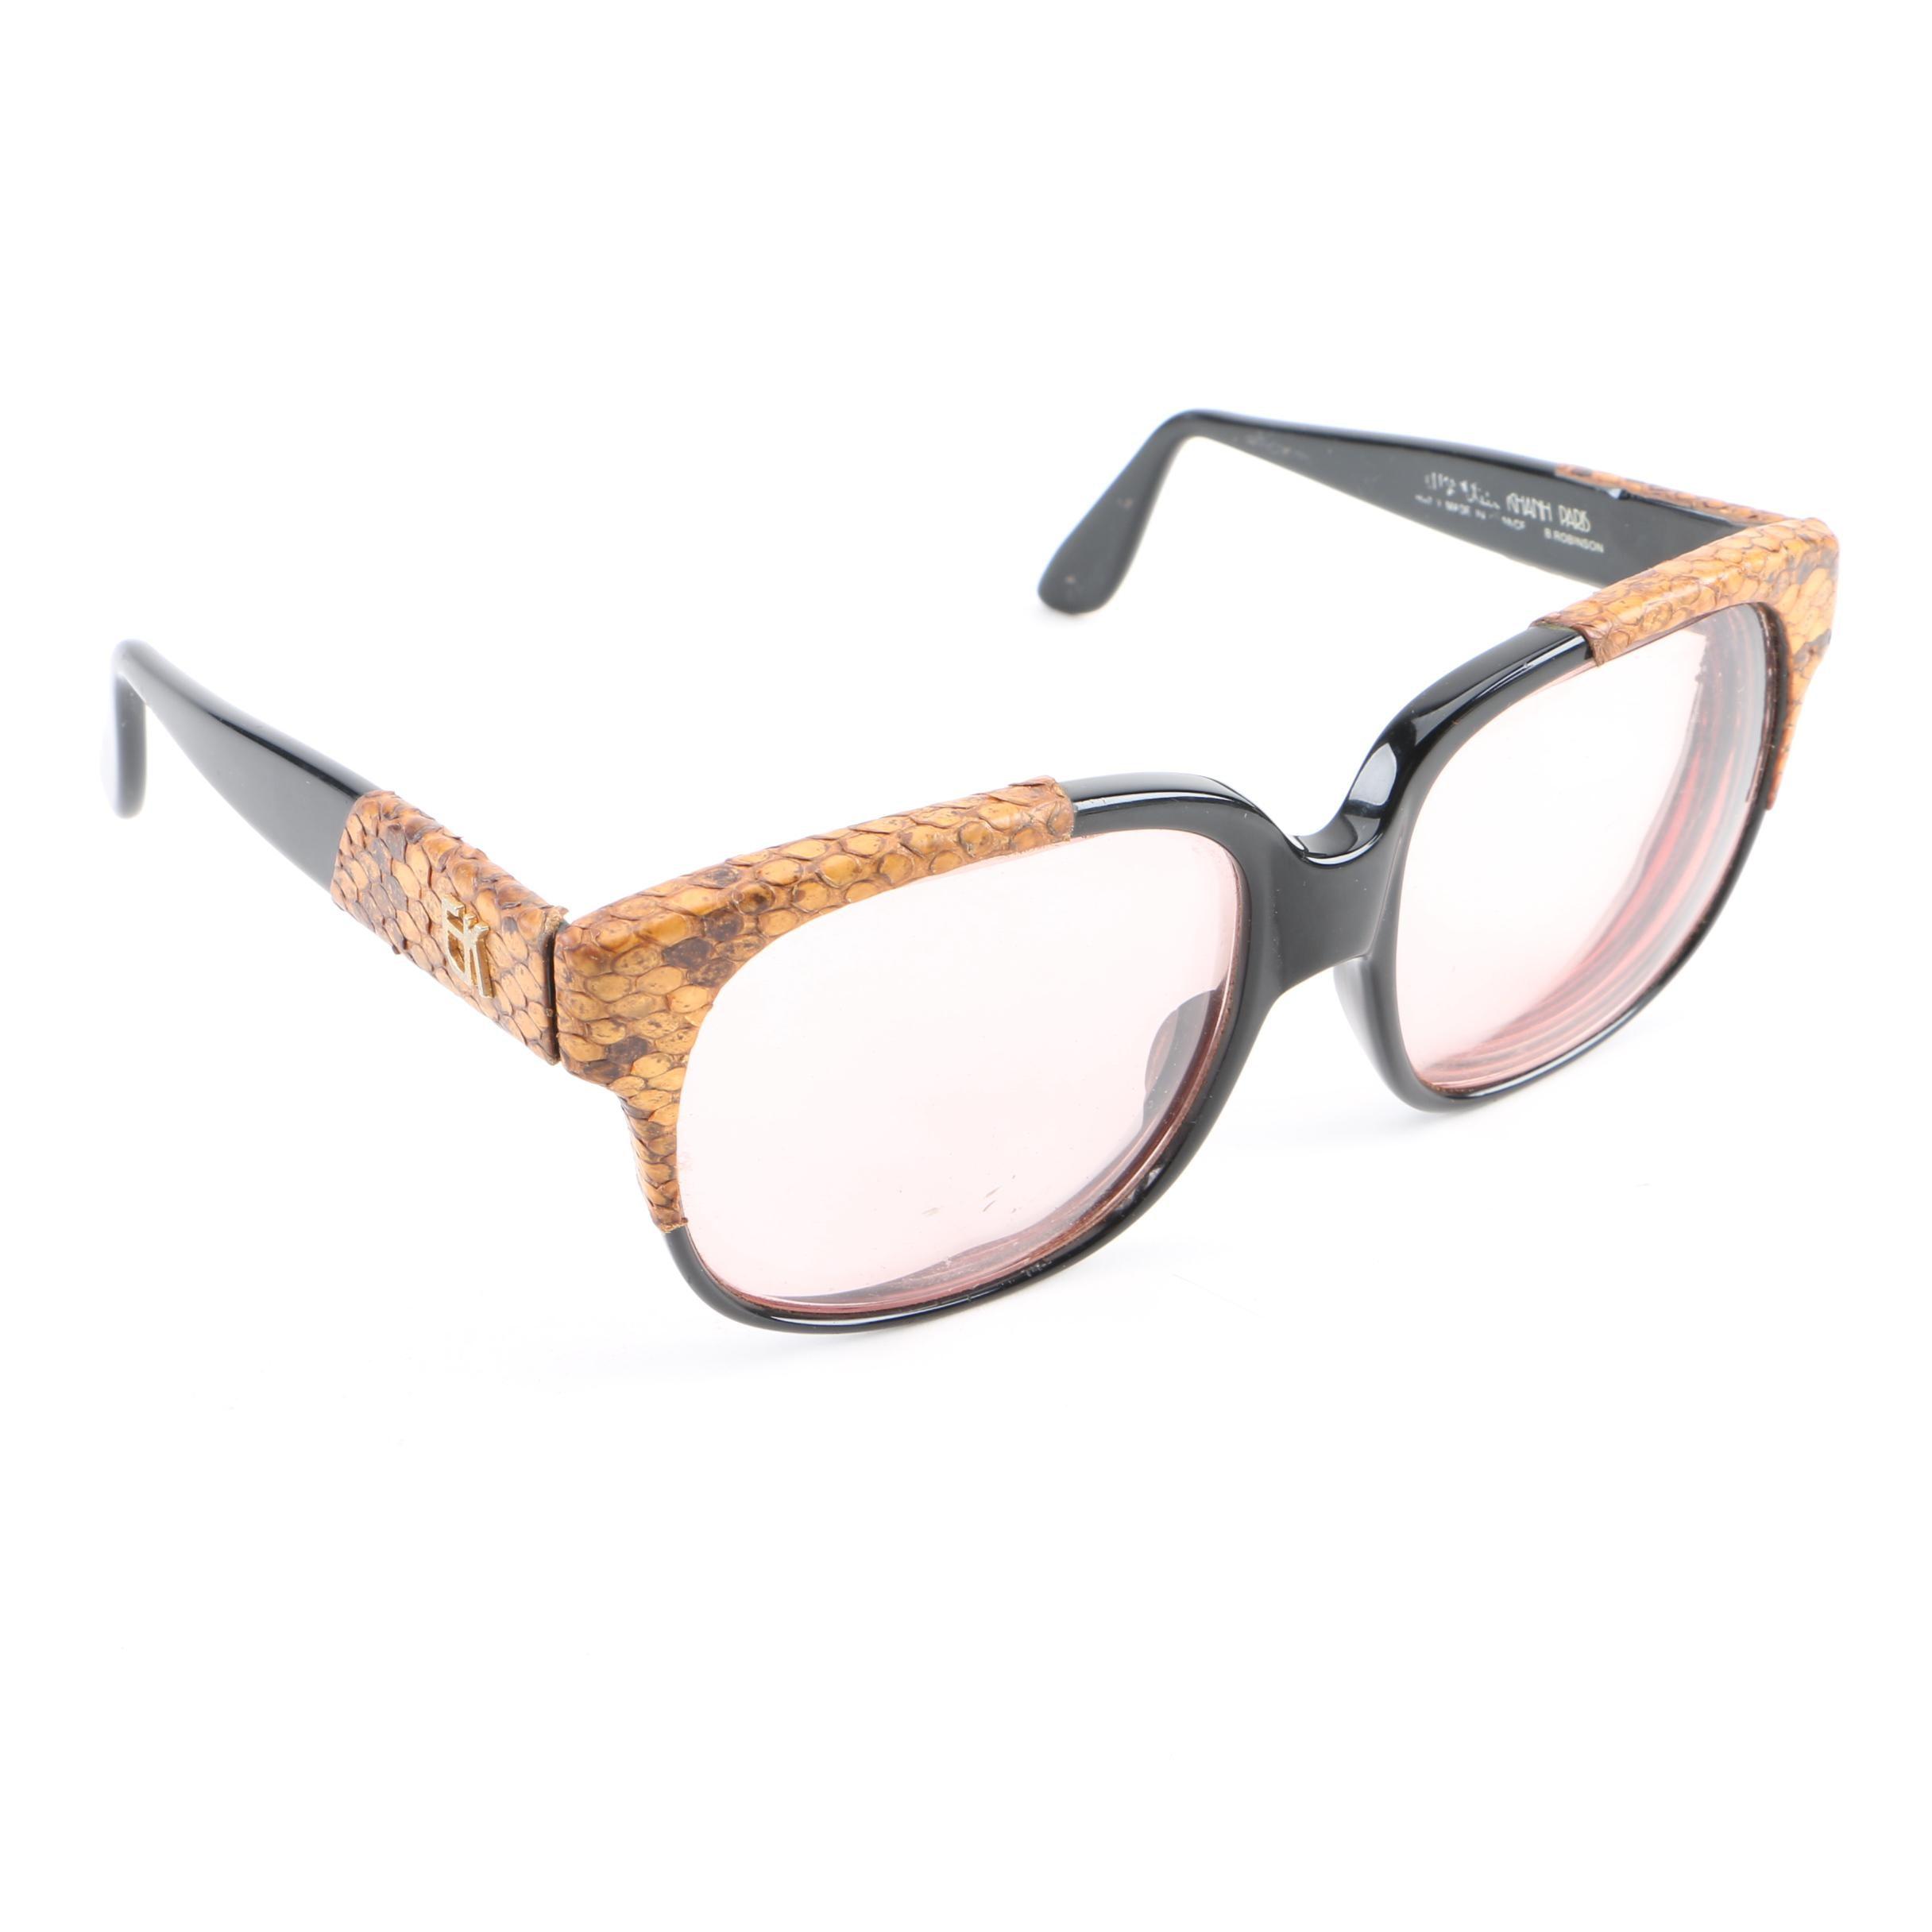 Circa 1970s Vintage Emmanuelle Khanh Sunglasses with Snakeskin Accented Frames